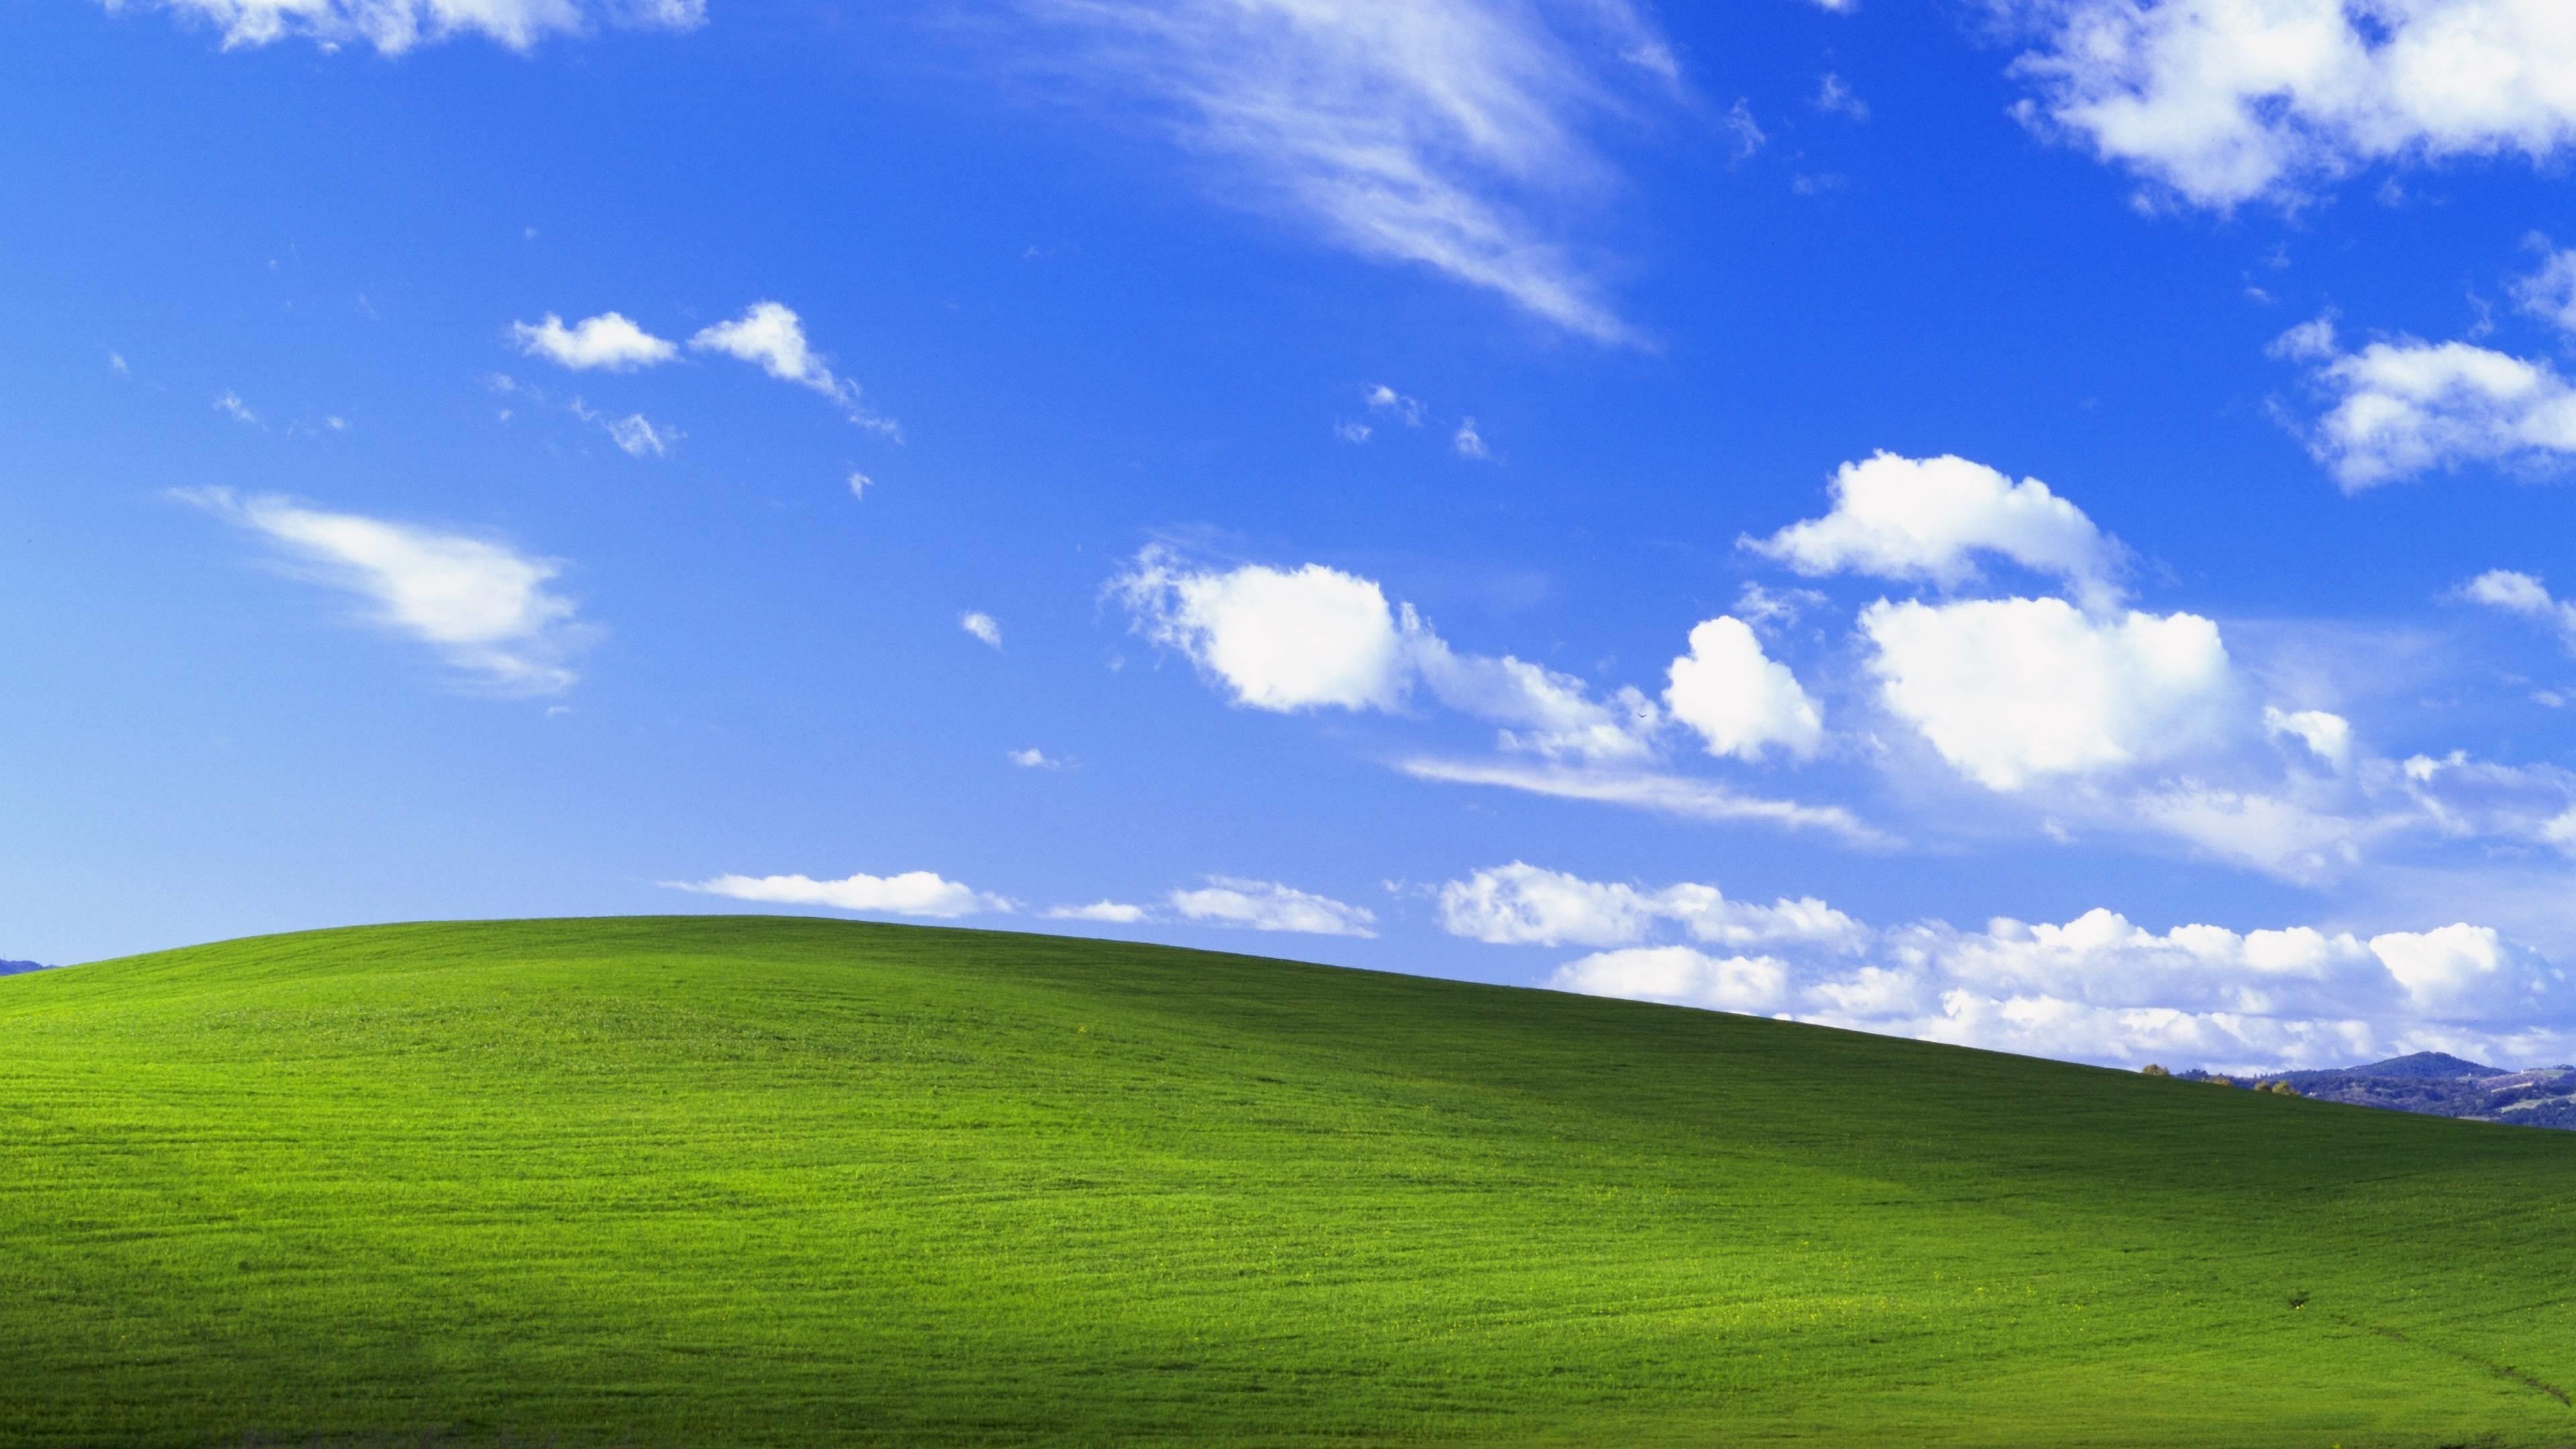 The Windows XP wallpaper at 4K resolution …